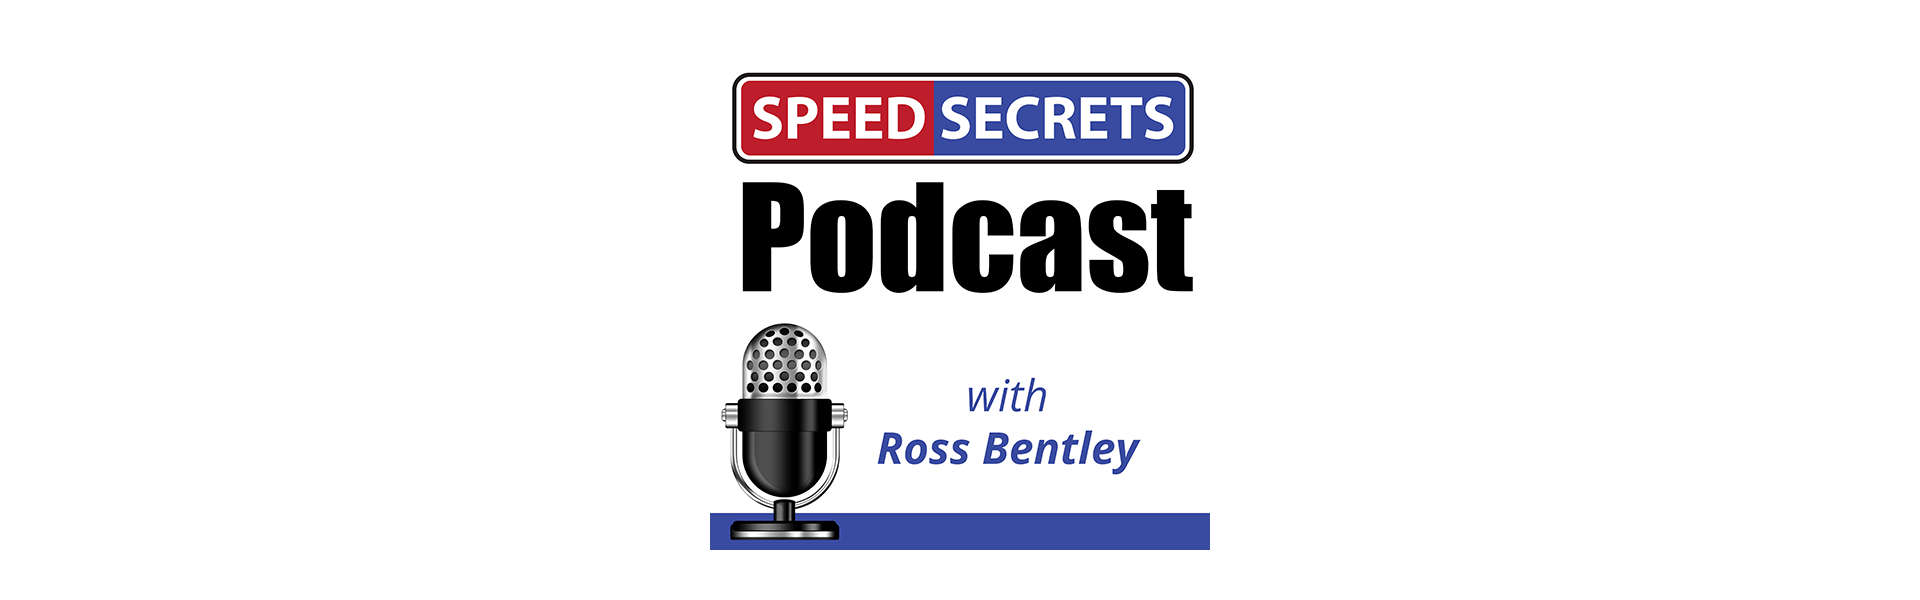 06_Speed Secrets Podcast logo